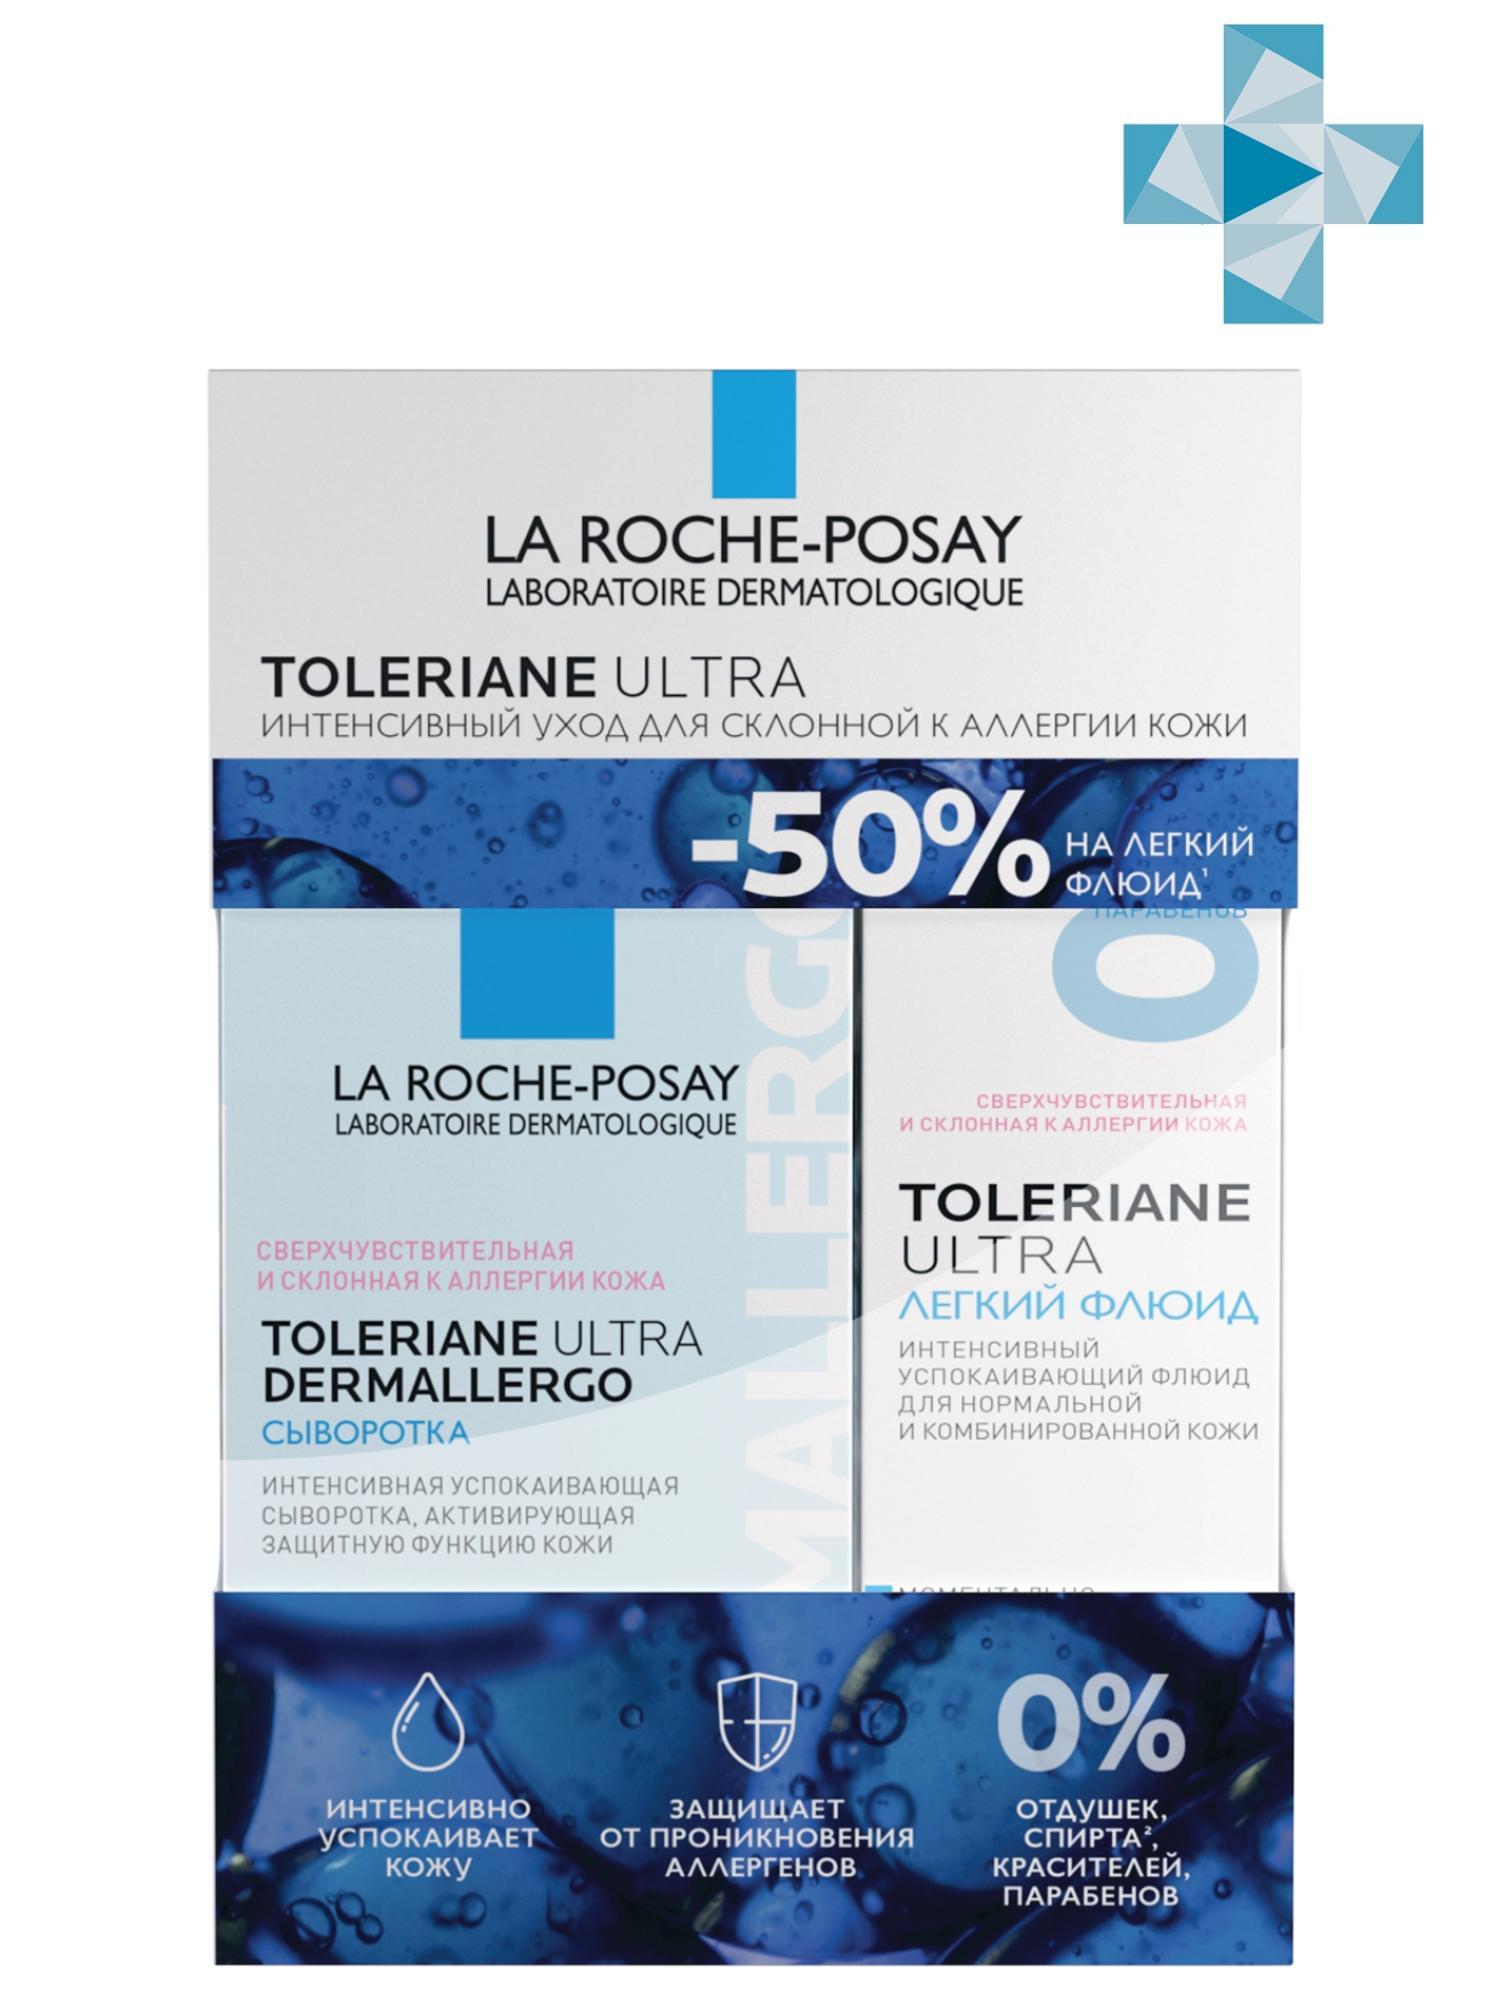 Купить La Roche-Posay Набор Толеран Ультра Дермаллерго сыворотка 20 мл + Толеран Ультра Легкий Флюид 40 мл (La Roche-Posay, Toleriane), Франция